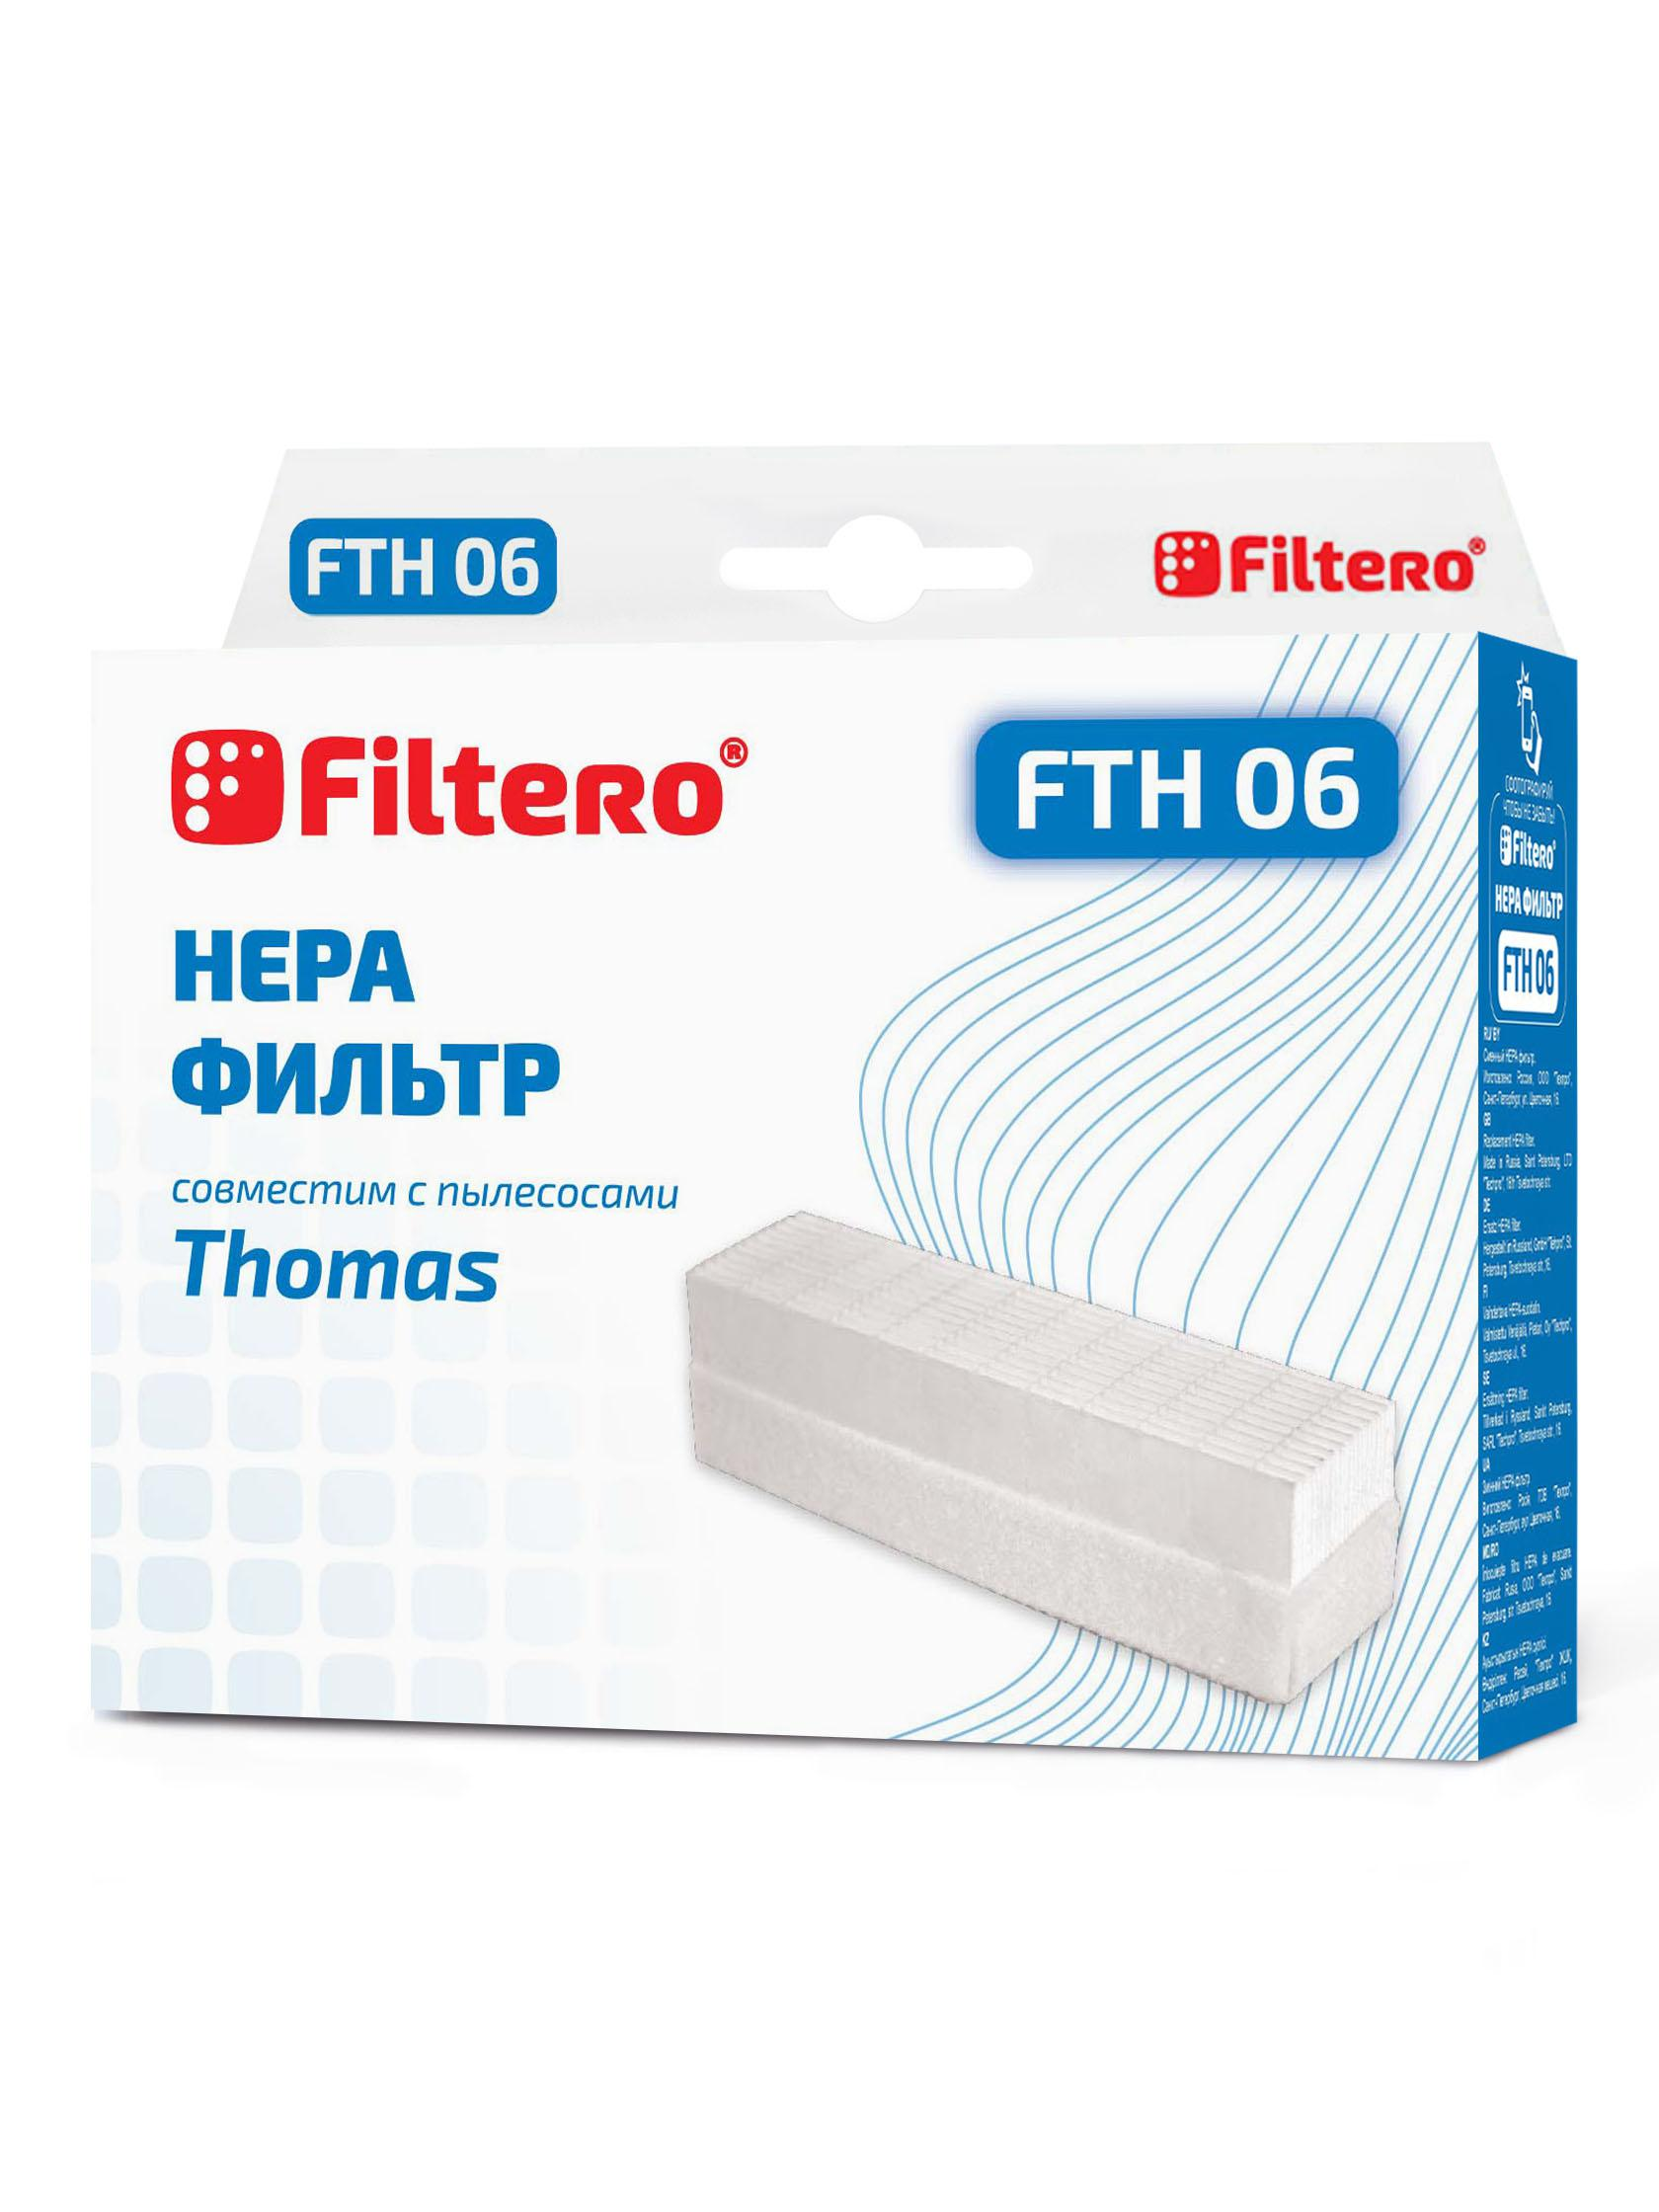 Фильтр Filtero Fth 06 tms набор фильтров filtero fth 99 tms hepa для thomas xt